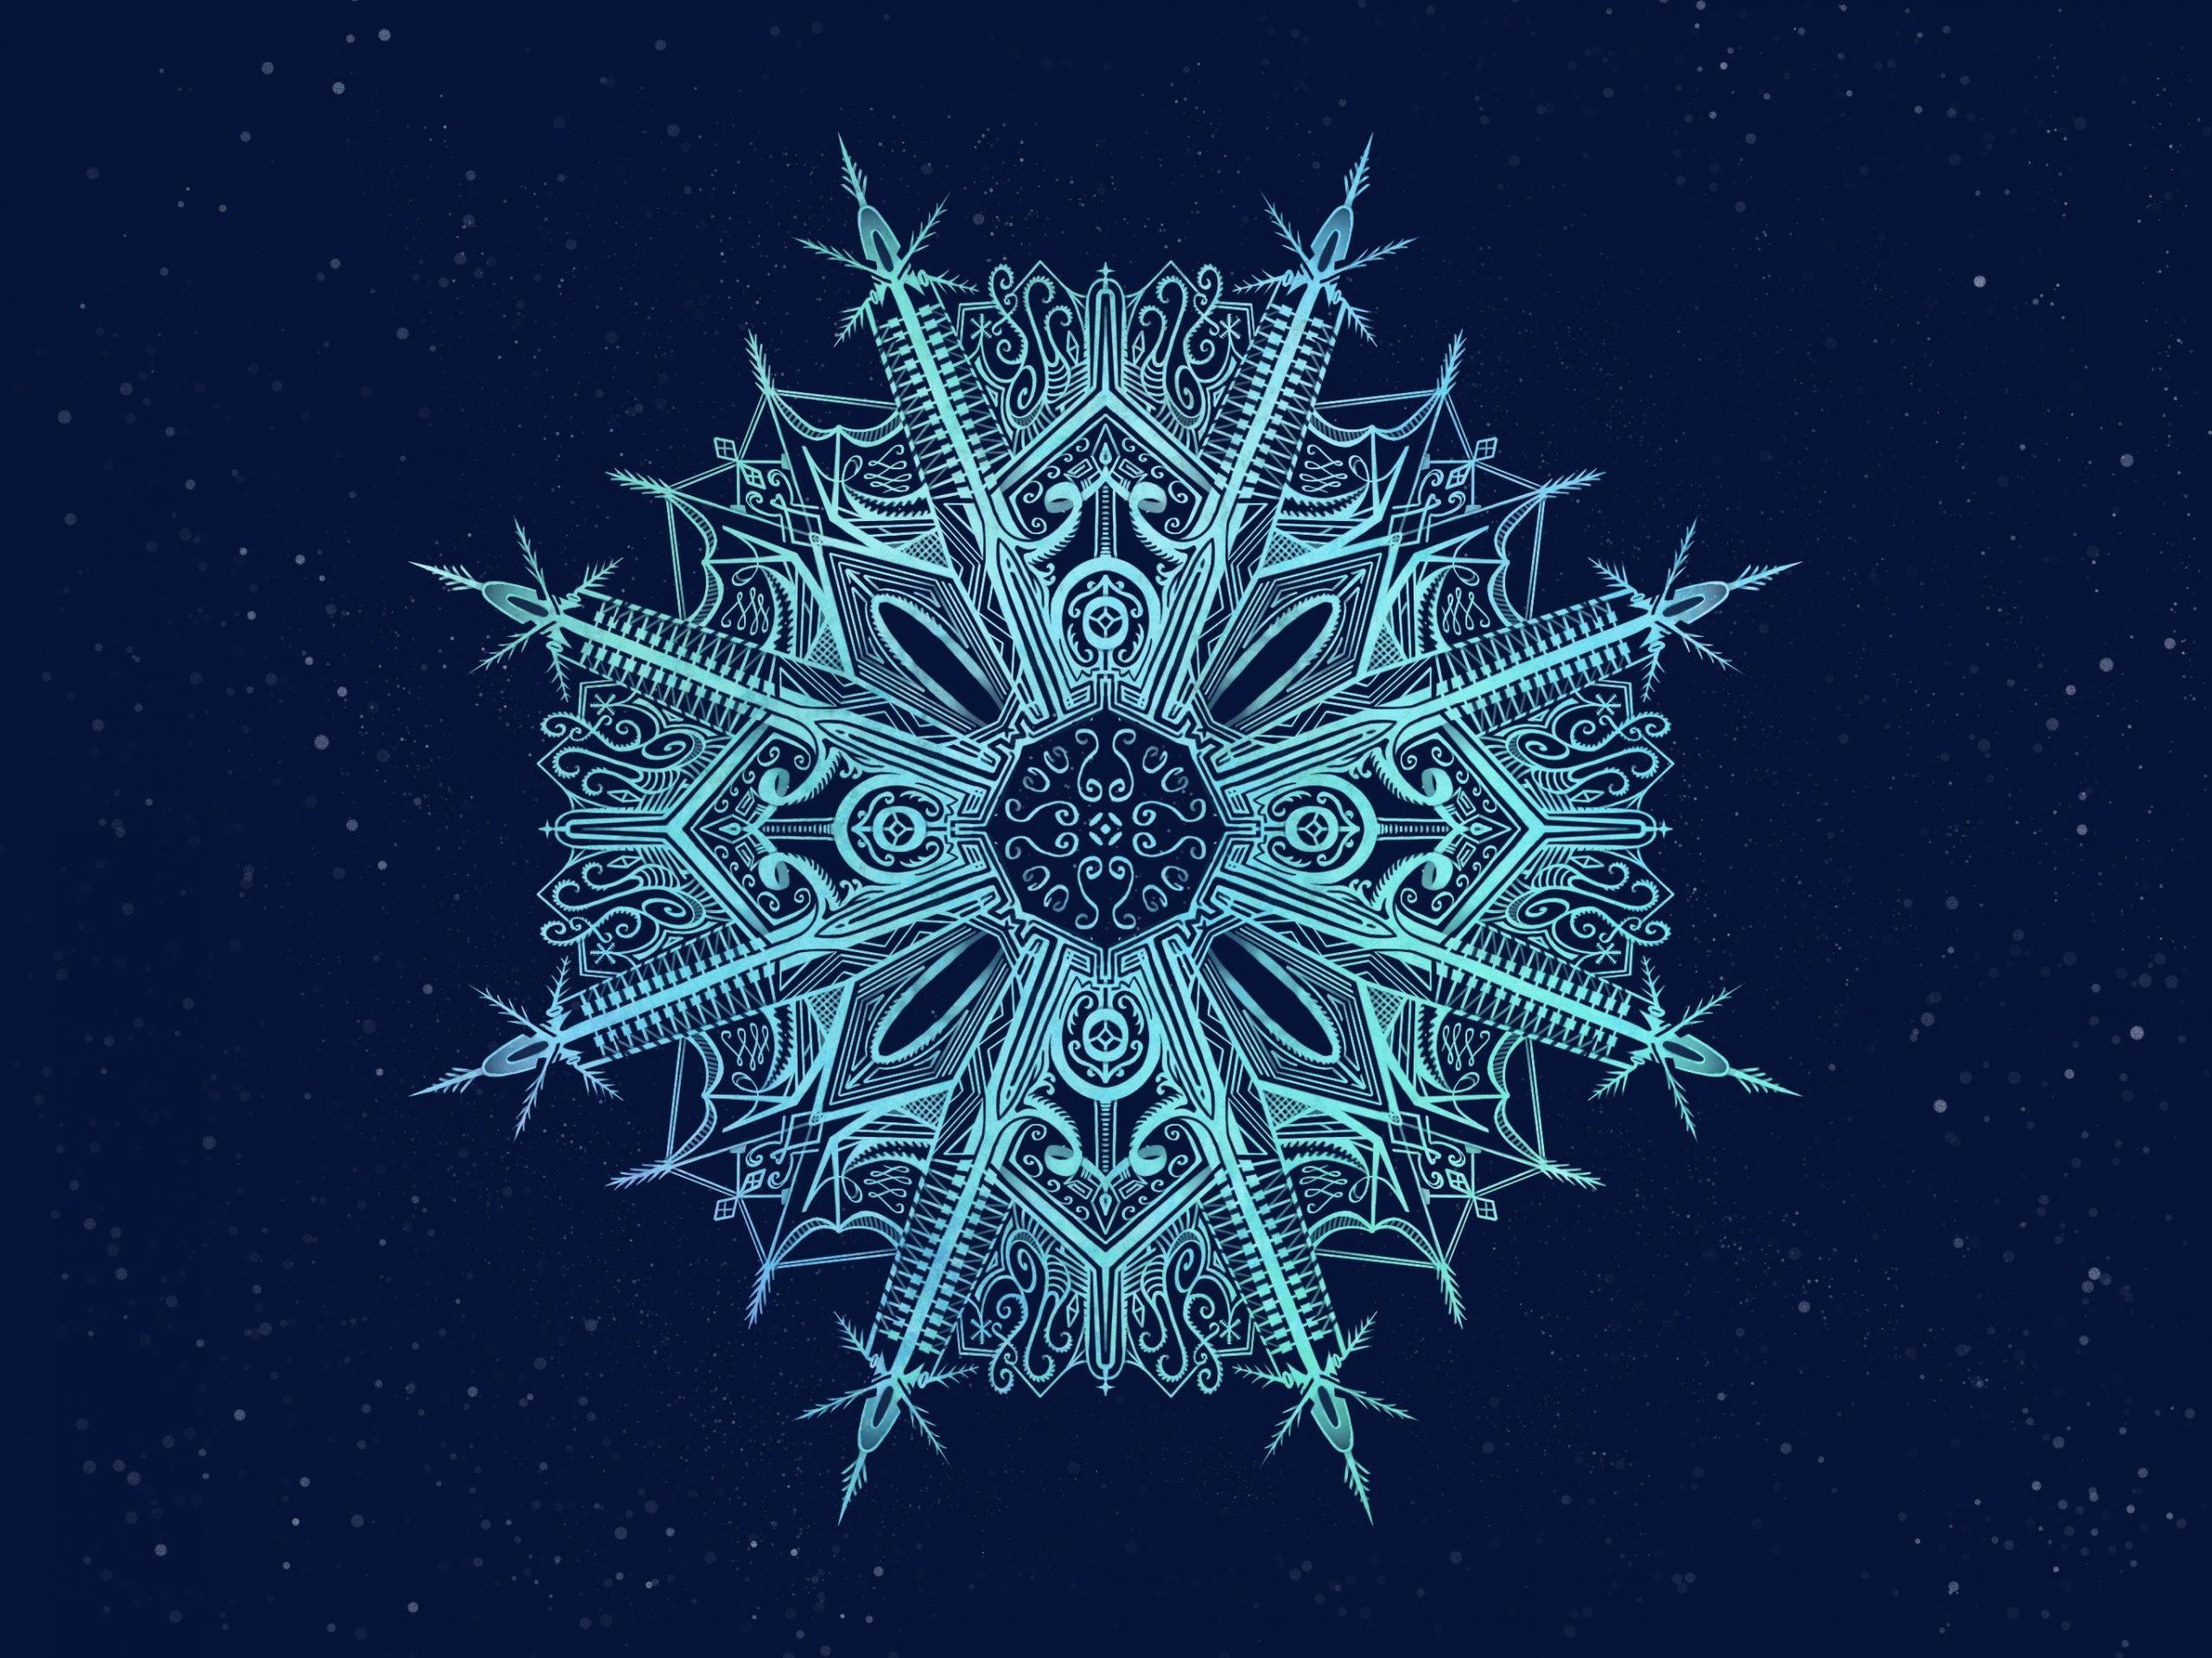 Hand-drawn Snowflake